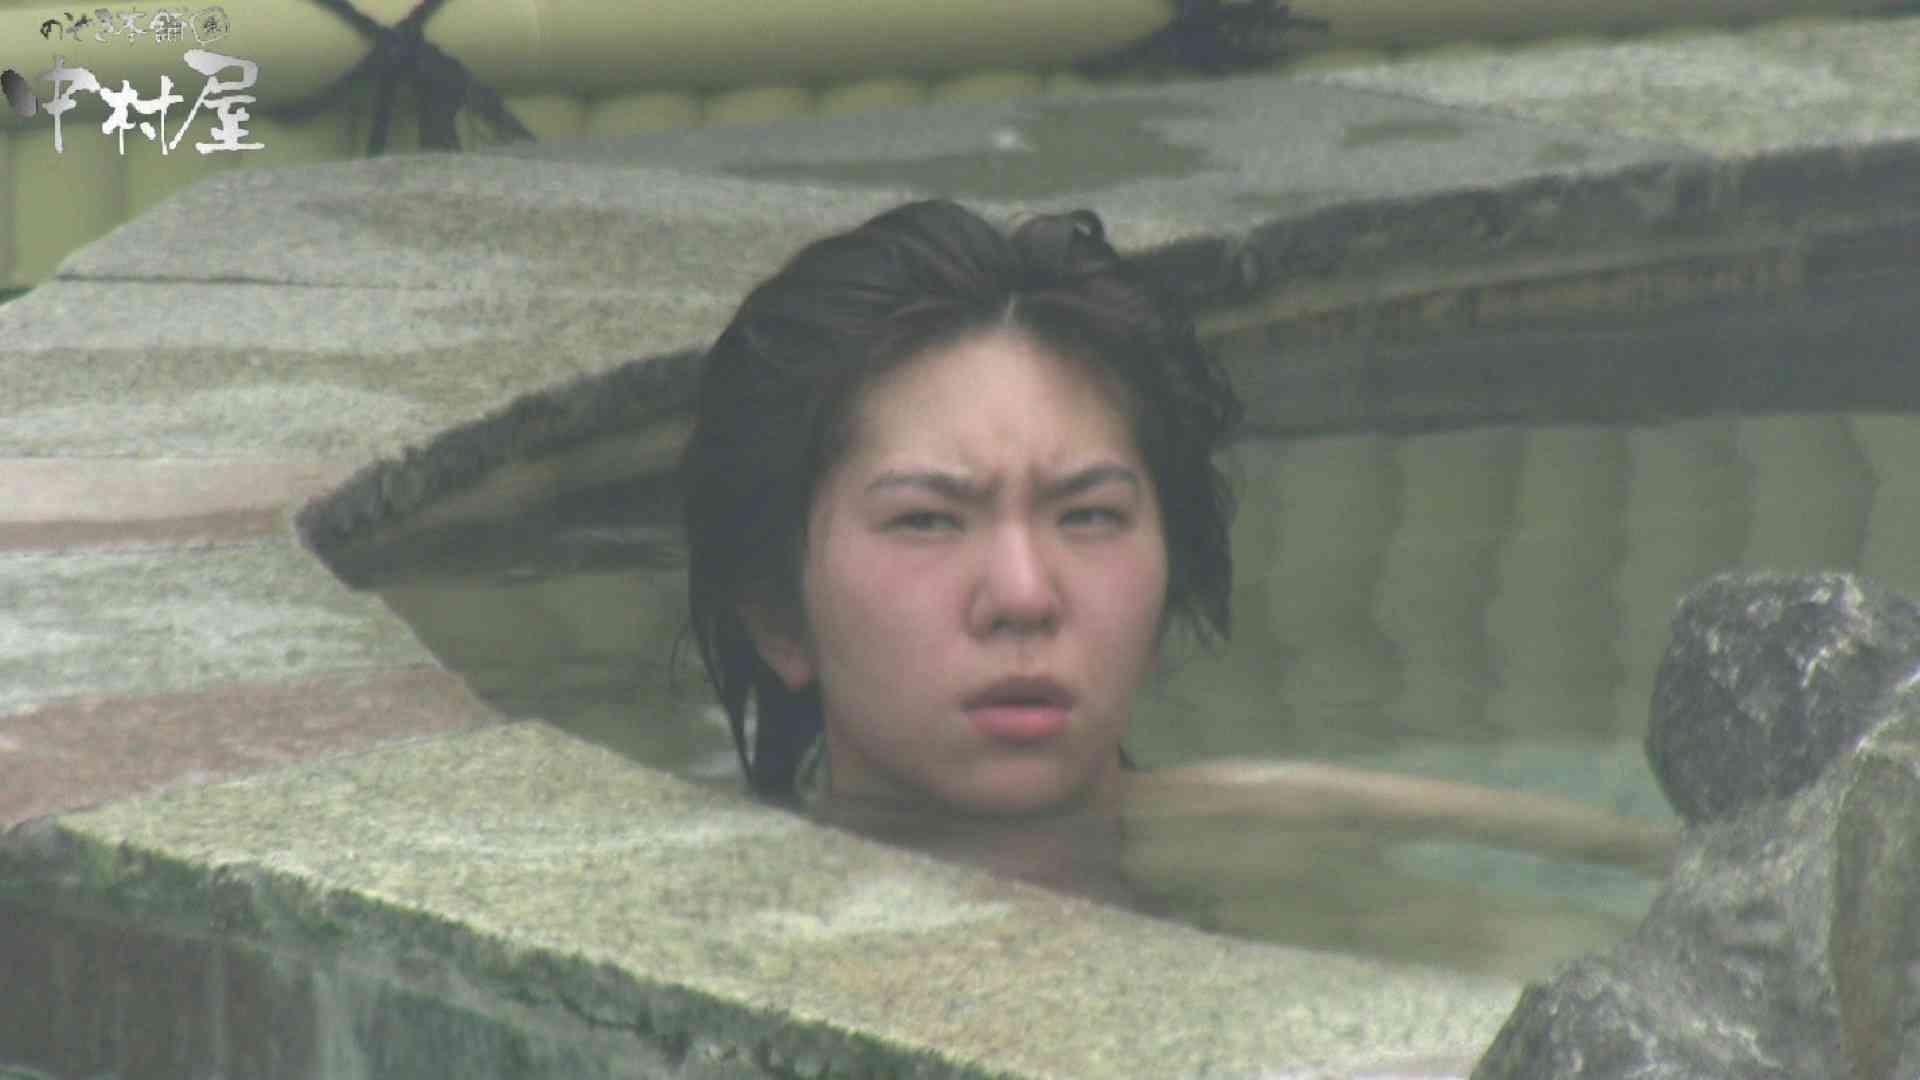 Aquaな露天風呂Vol.907 盗撮師作品  70pic 12